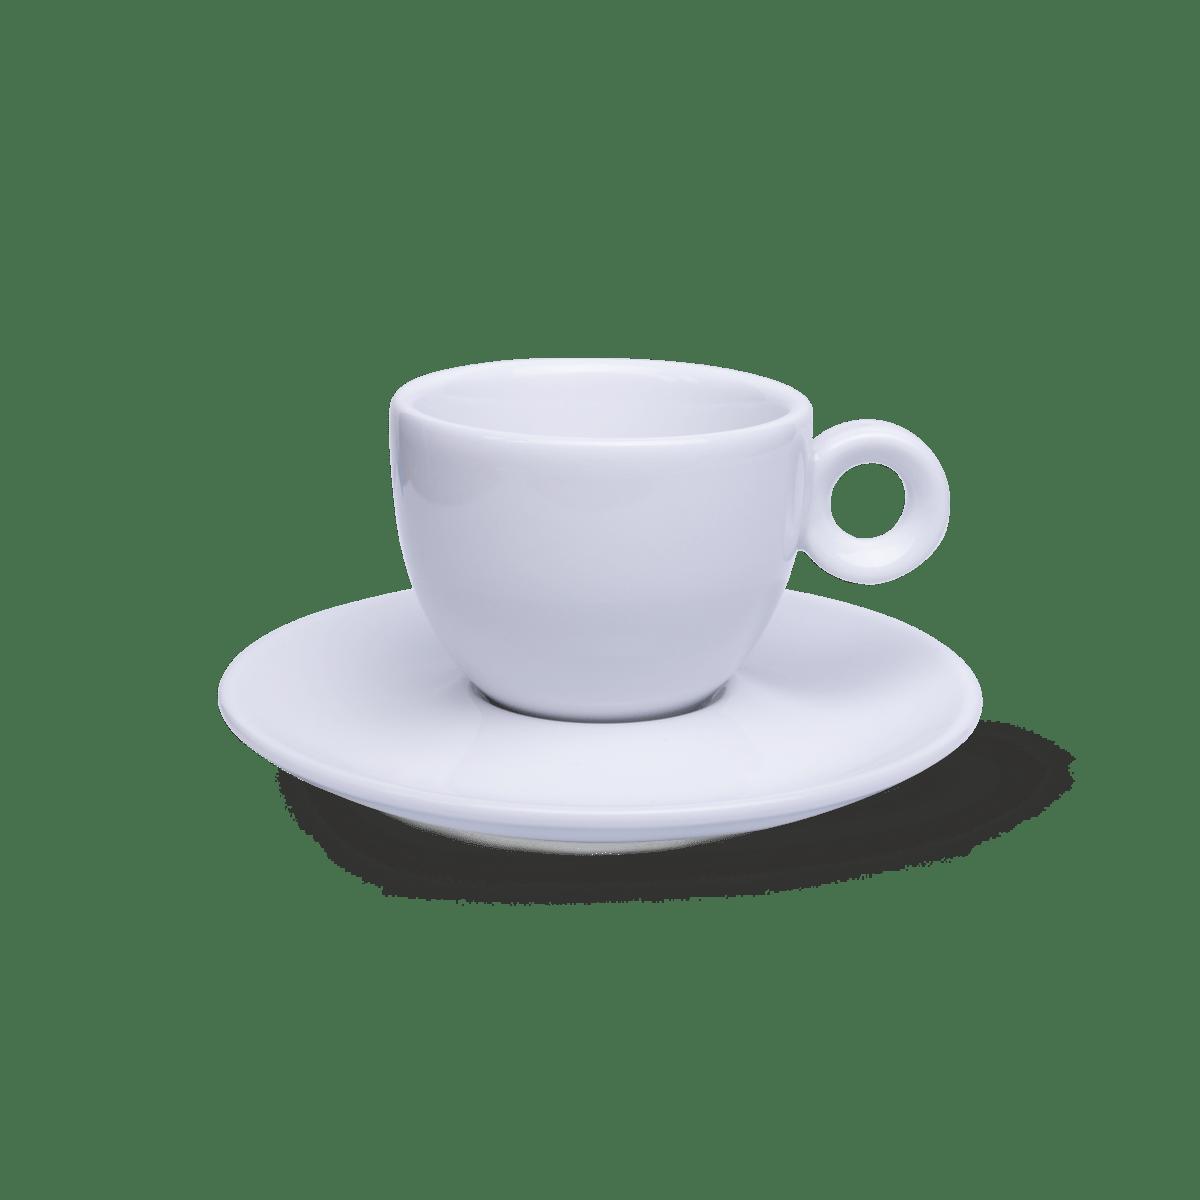 Tazzine Venezia Espresso